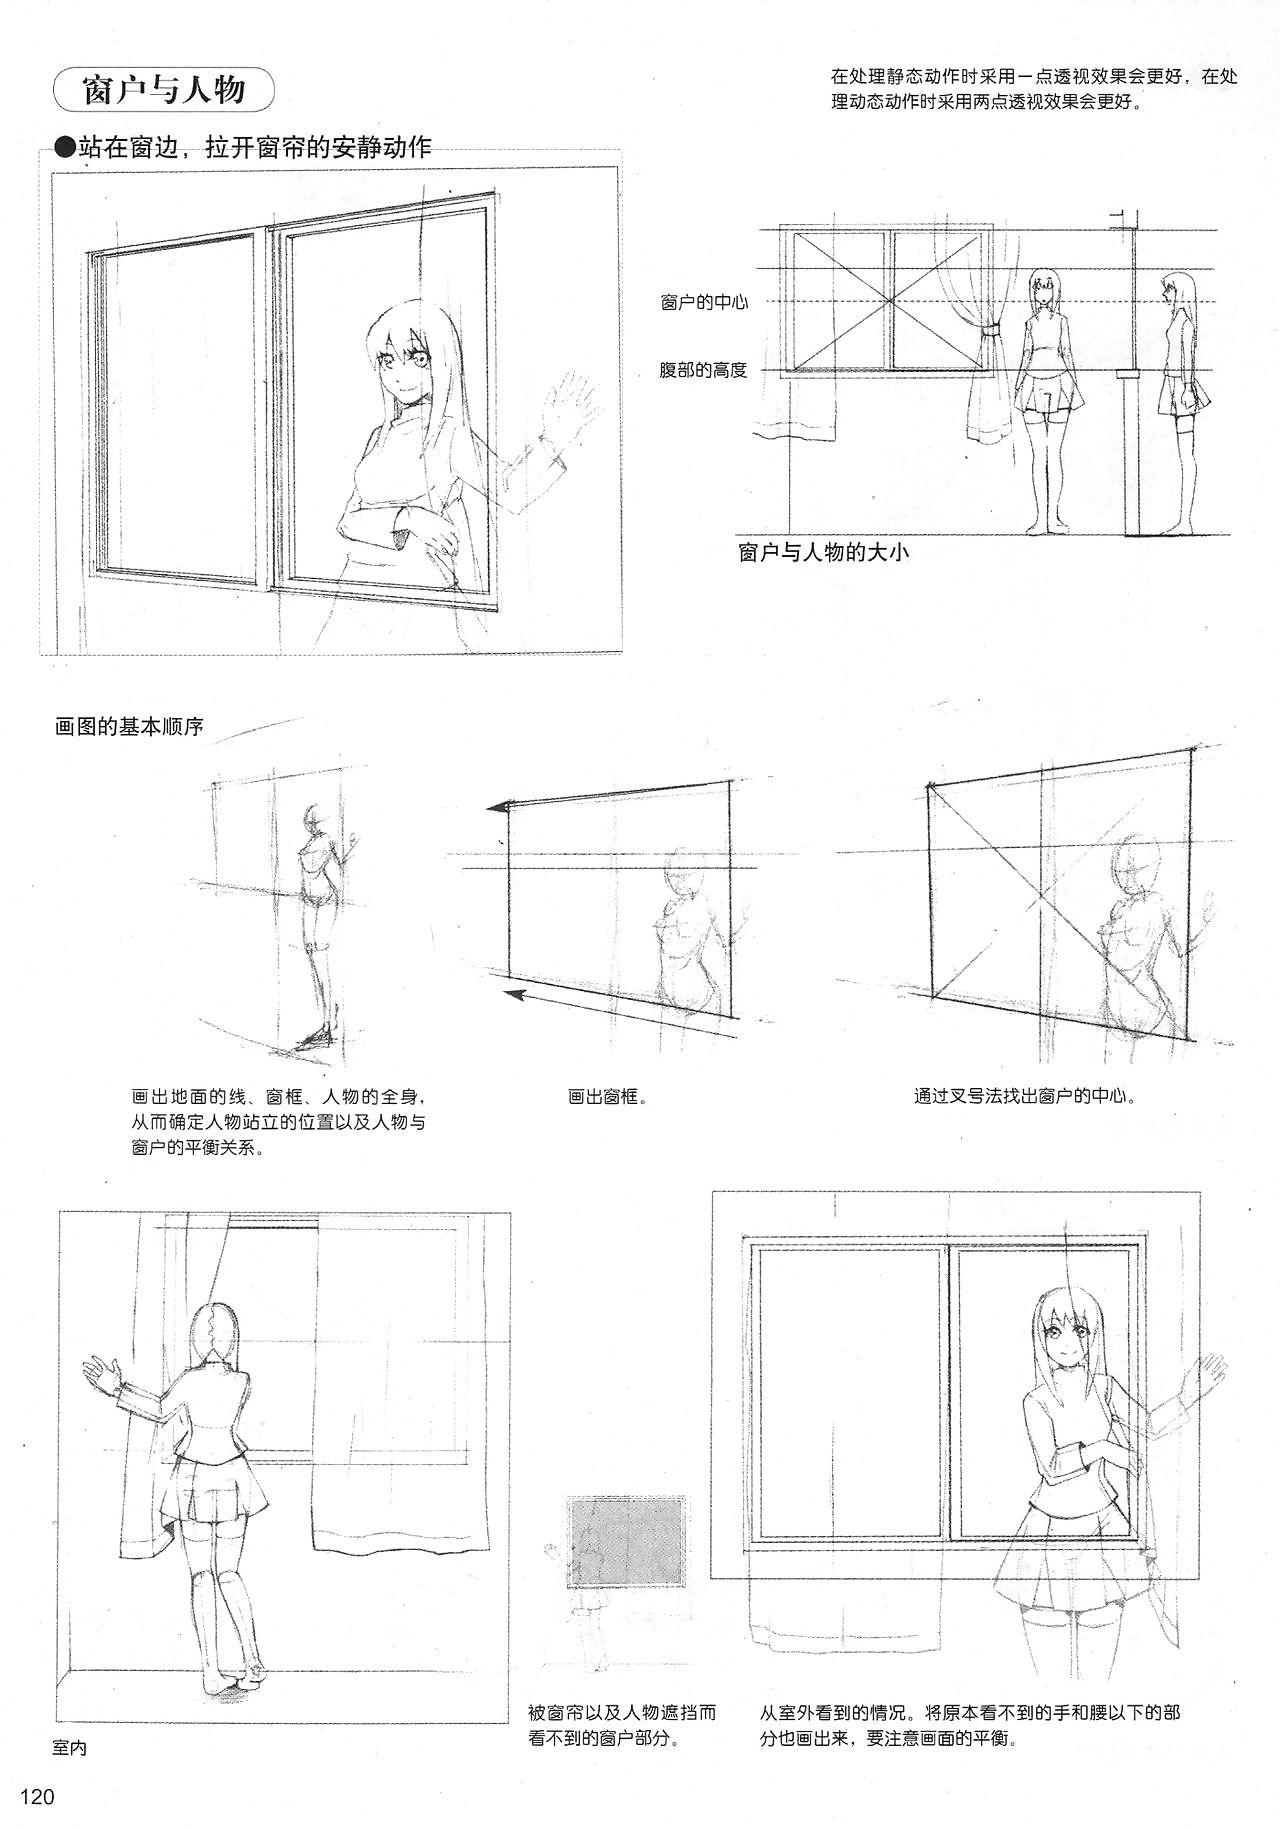 Regardless how beside Attitude Manga: Sketching Manga-Style Expanse 4: On all sides Here Ken - faithfulness 7